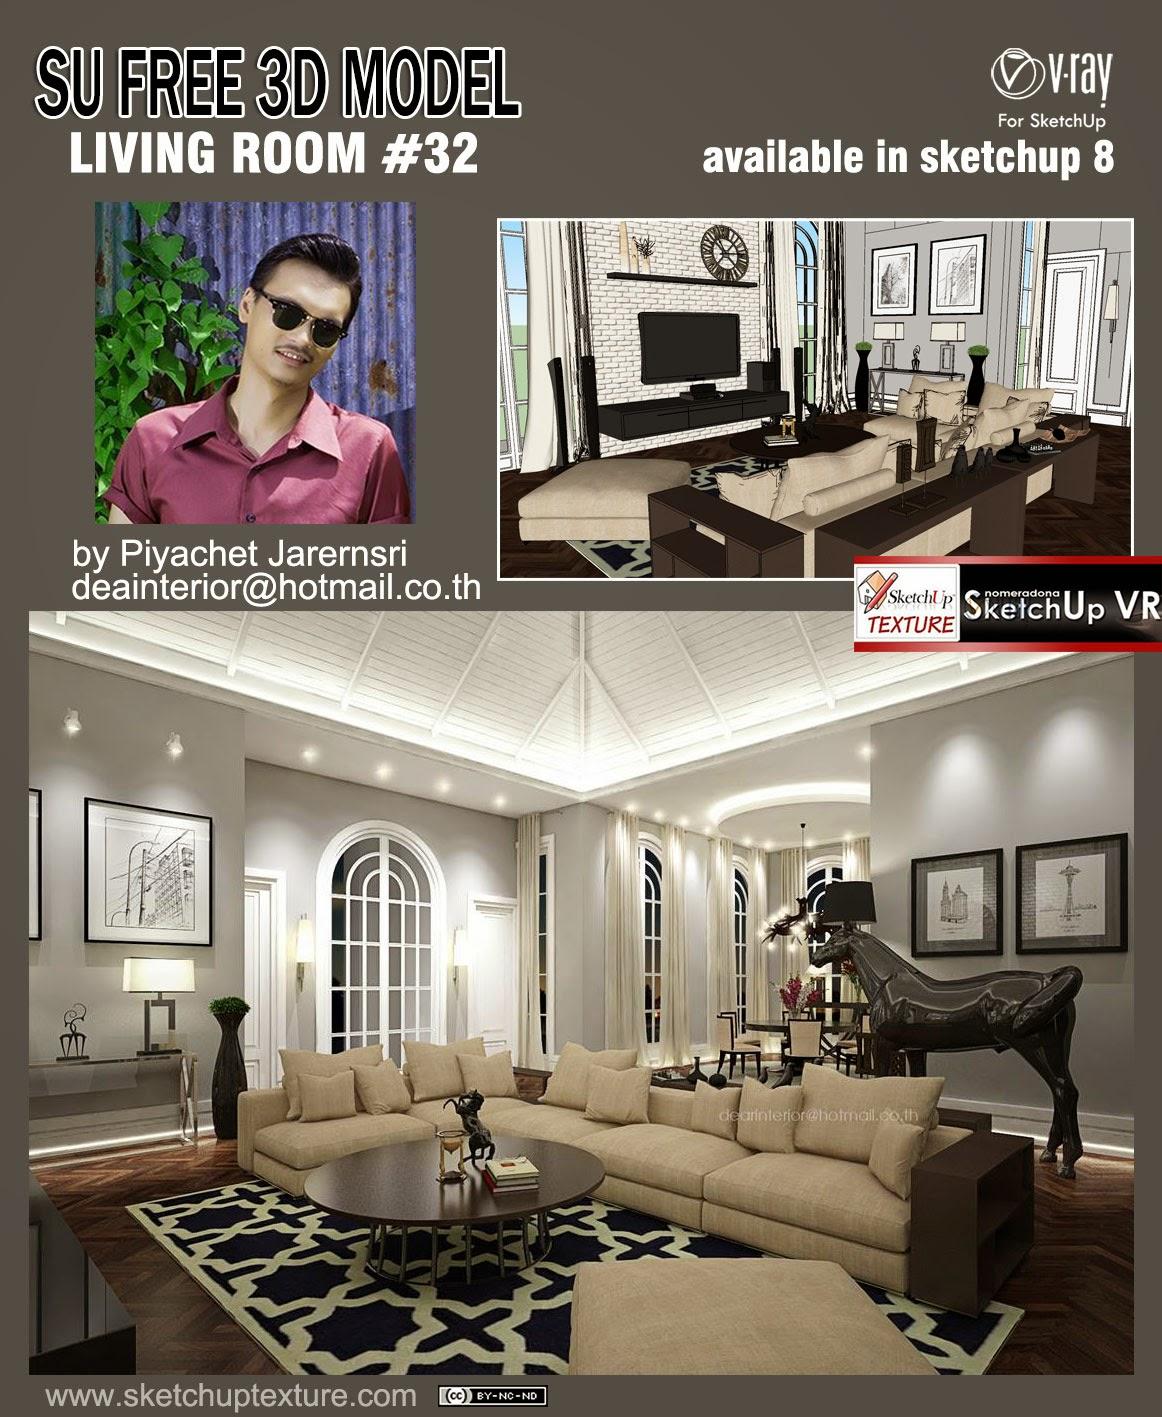 SKETCHUP TEXTURE: Free sketchup 3d model living room #32 vray setting